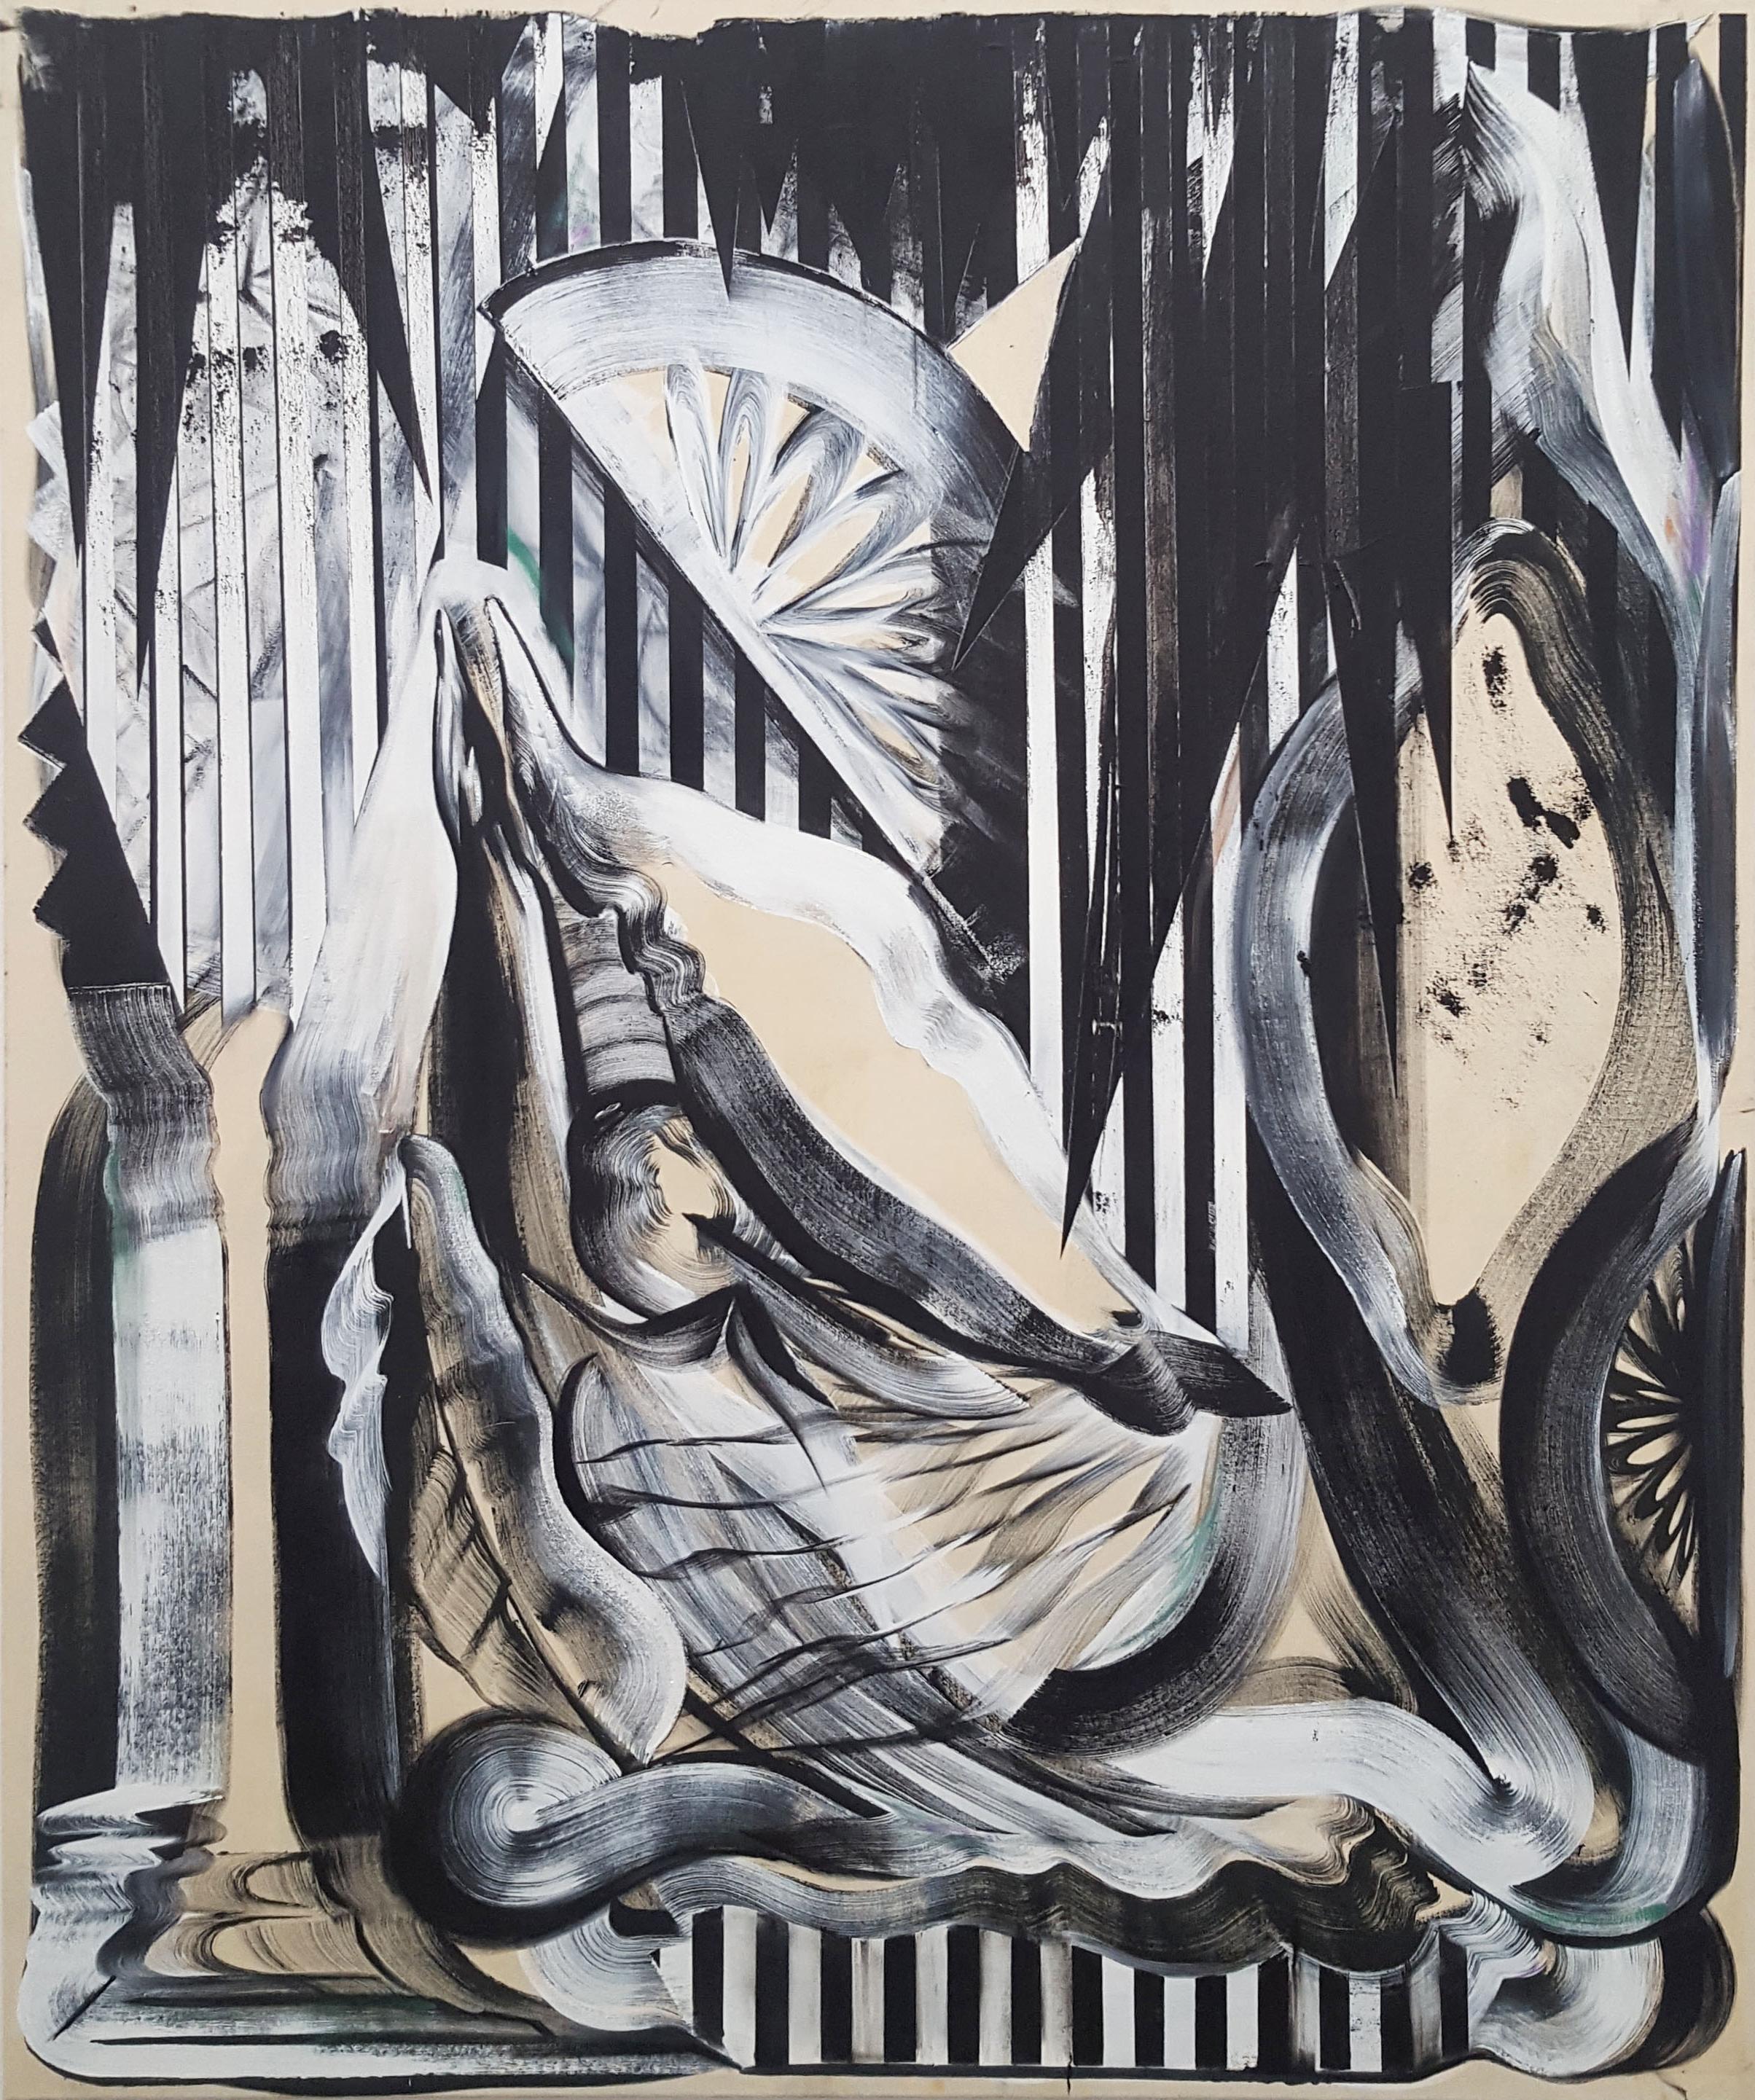 Janine van Oene / Buffet Bonafide / 2018 / 170 x 140 cm /  oil on canvas